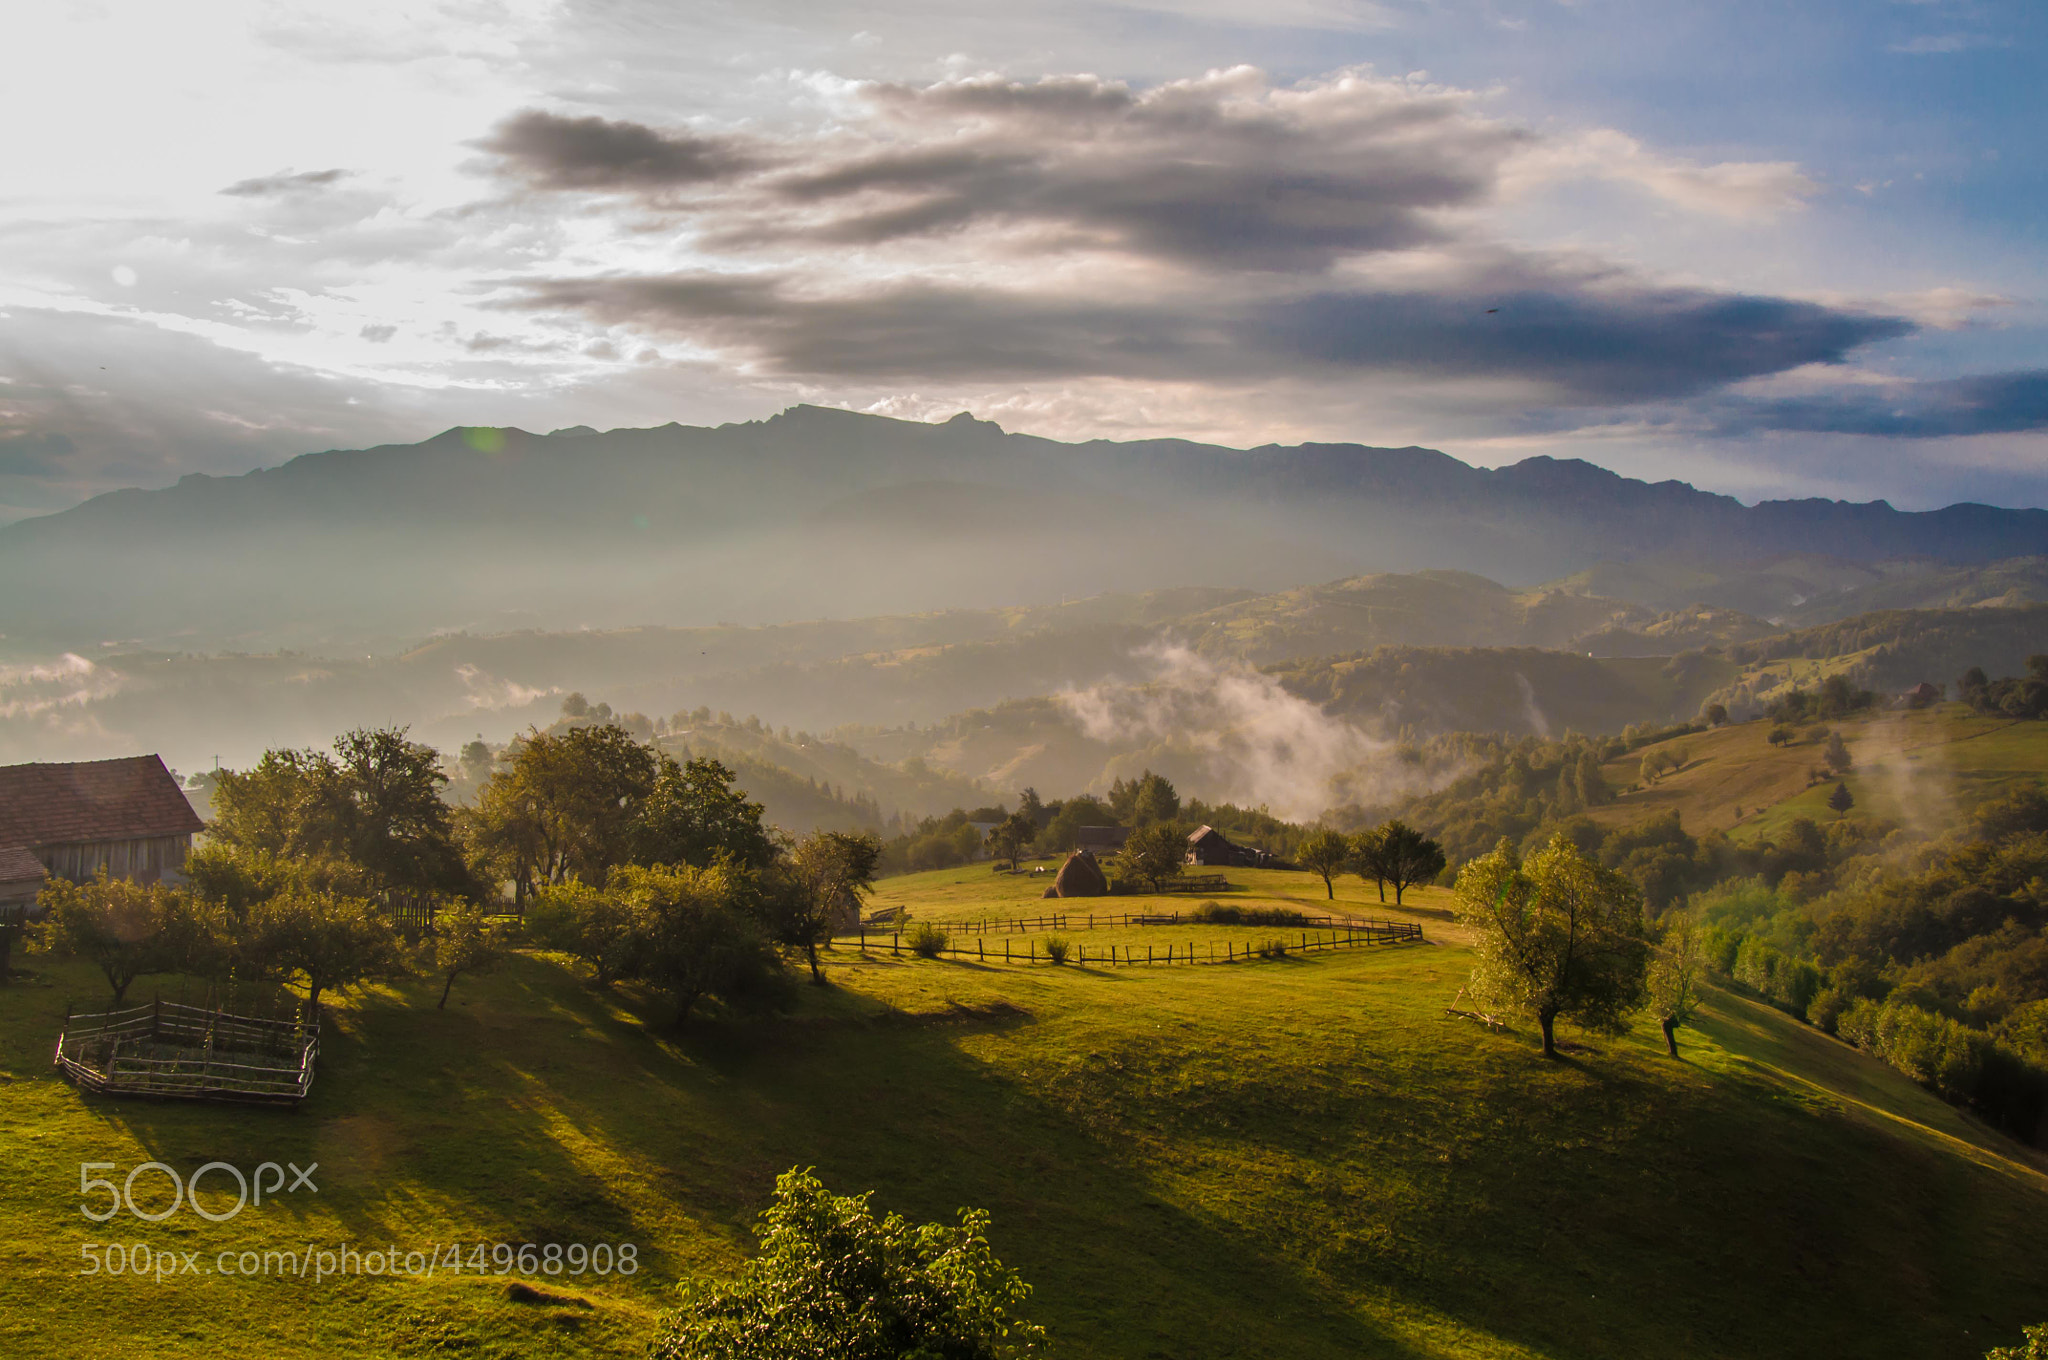 Photograph Good morning! by Andi Cretu on 500px